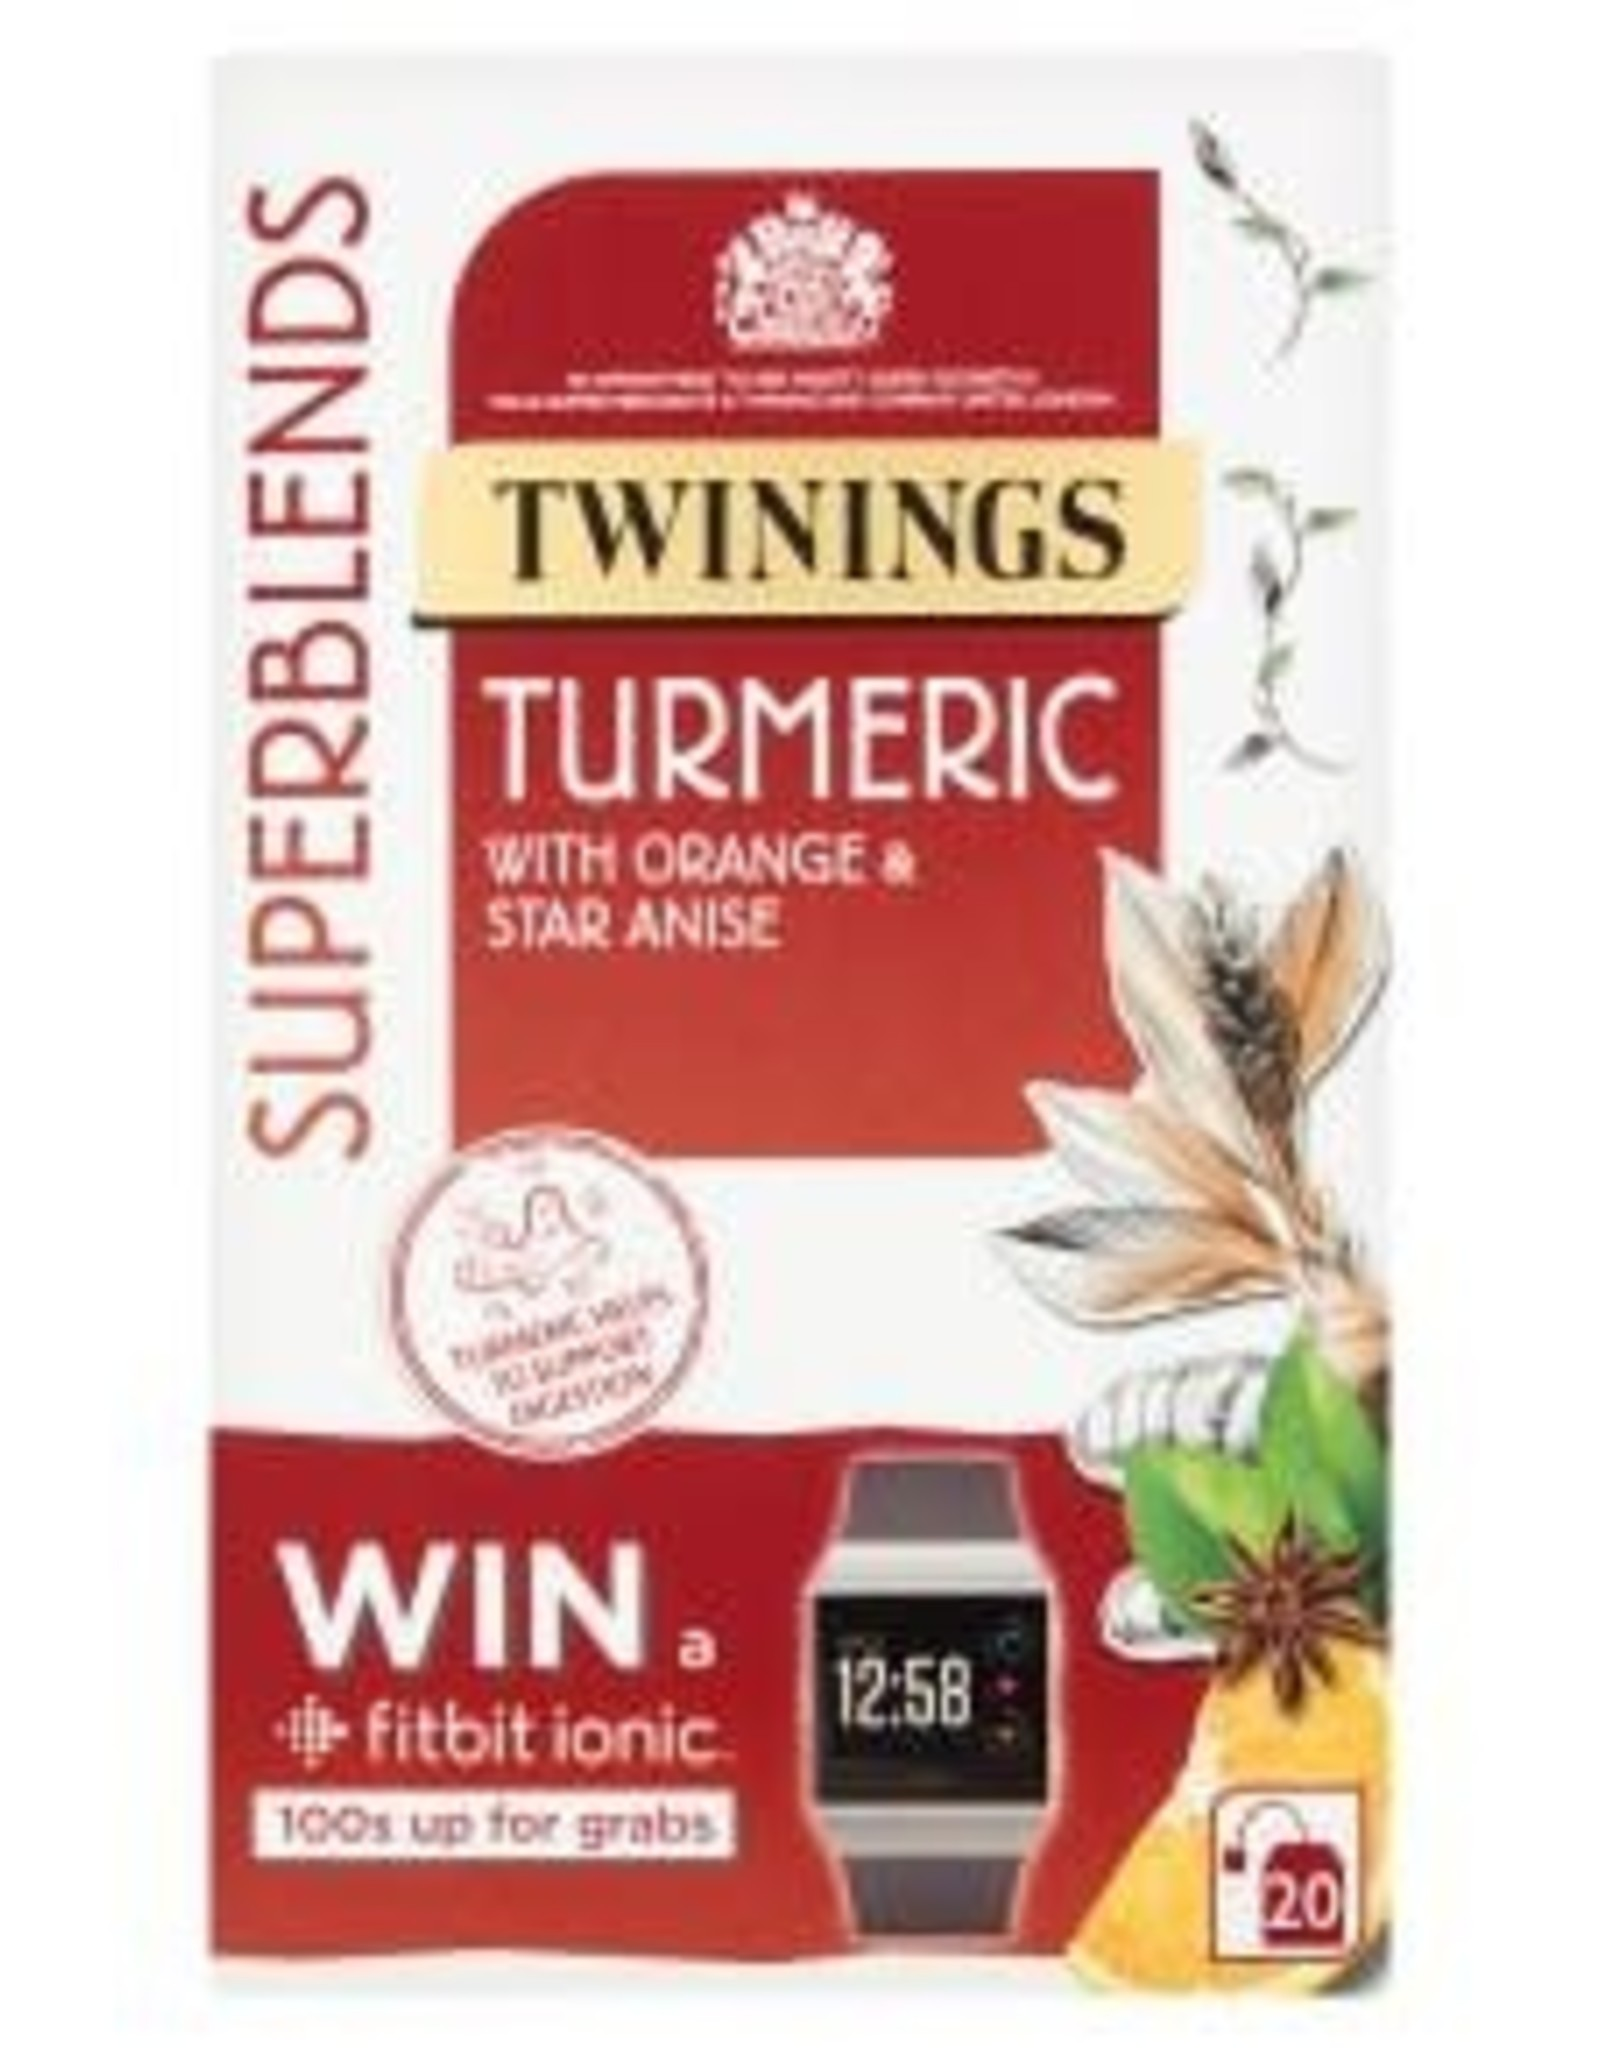 Twinings Twinings Matcha Green Tea Cranberry & Blood Orange 20's